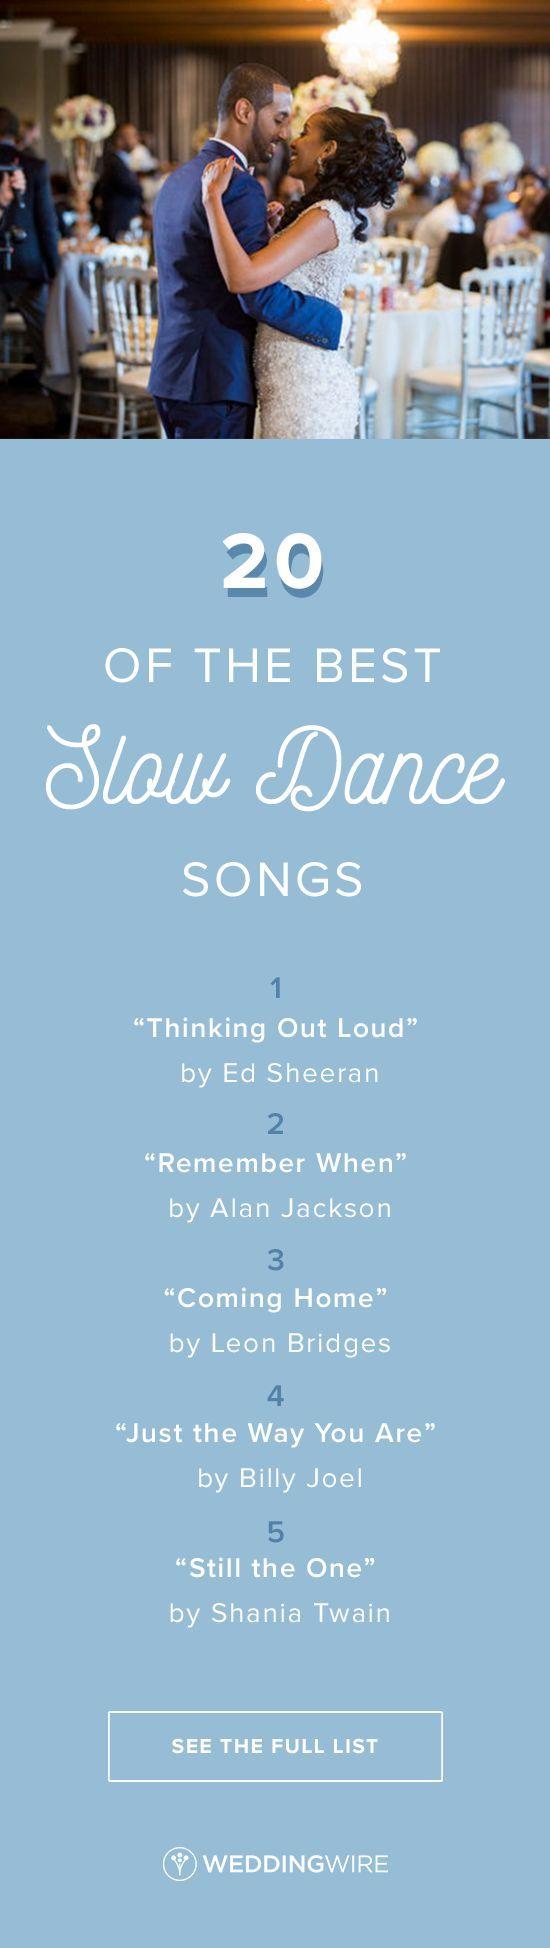 25 best ideas about slow dance songs on pinterest great